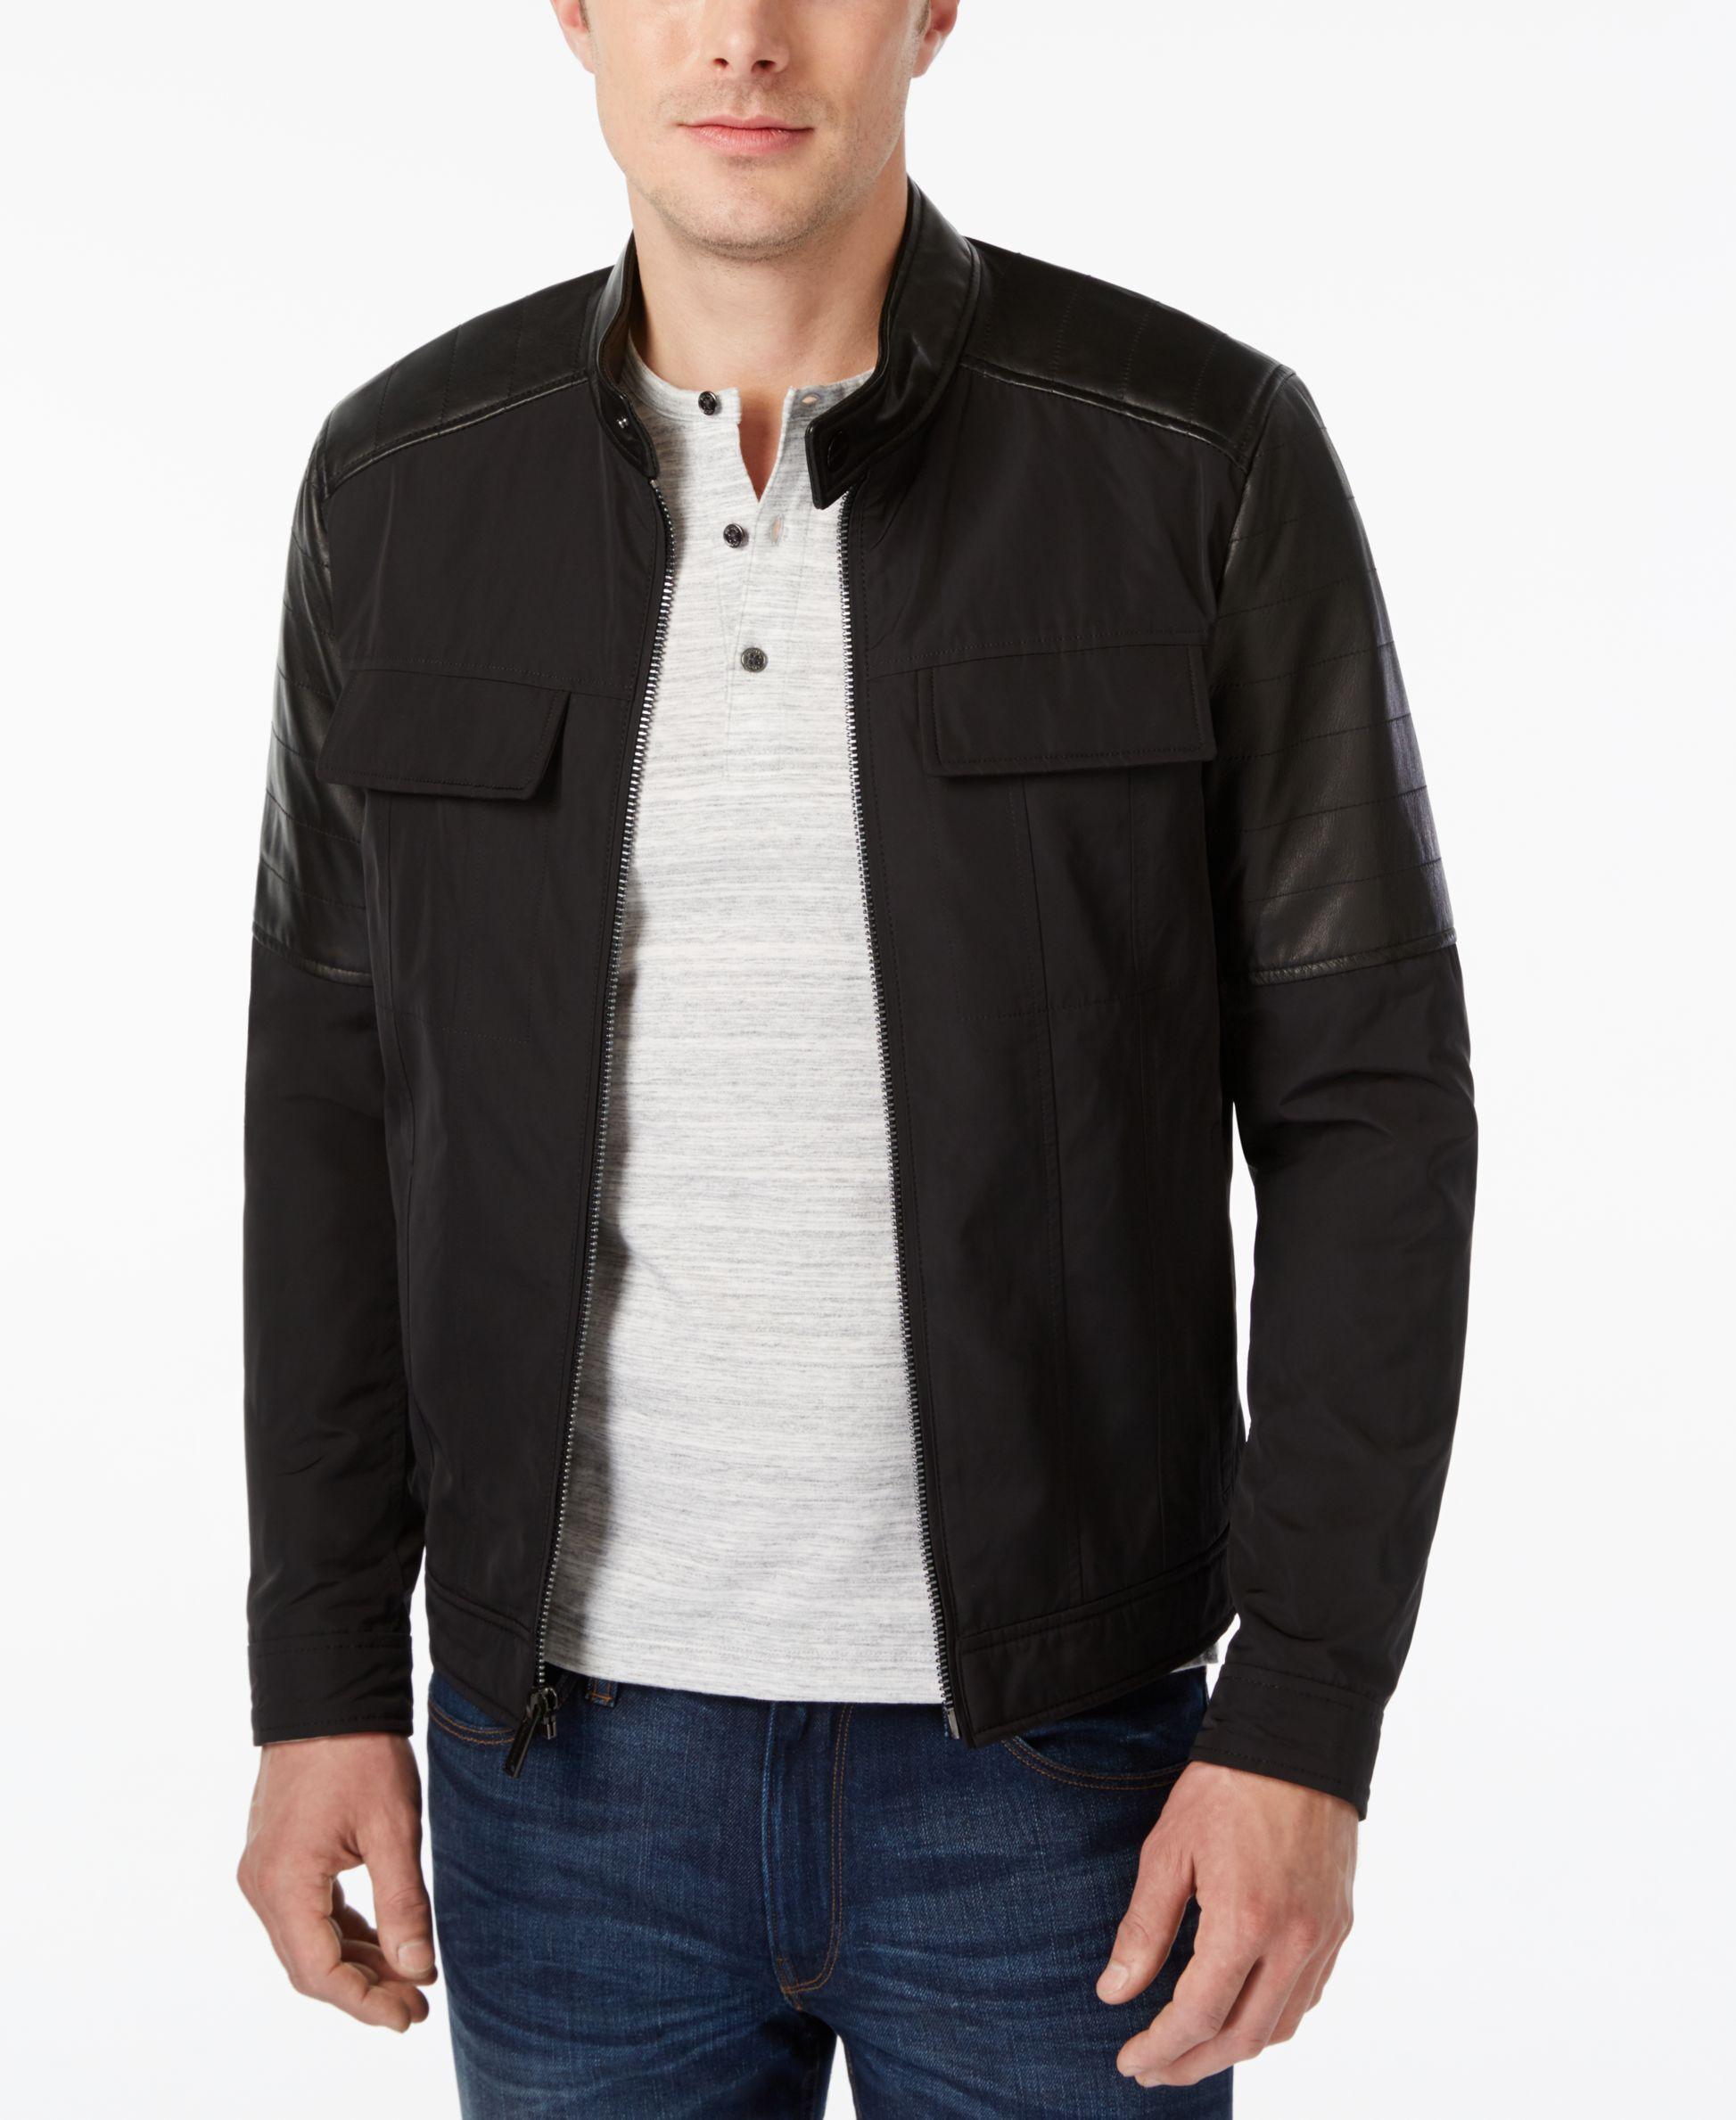 Michael Kors Men's Technical Moto Jacket